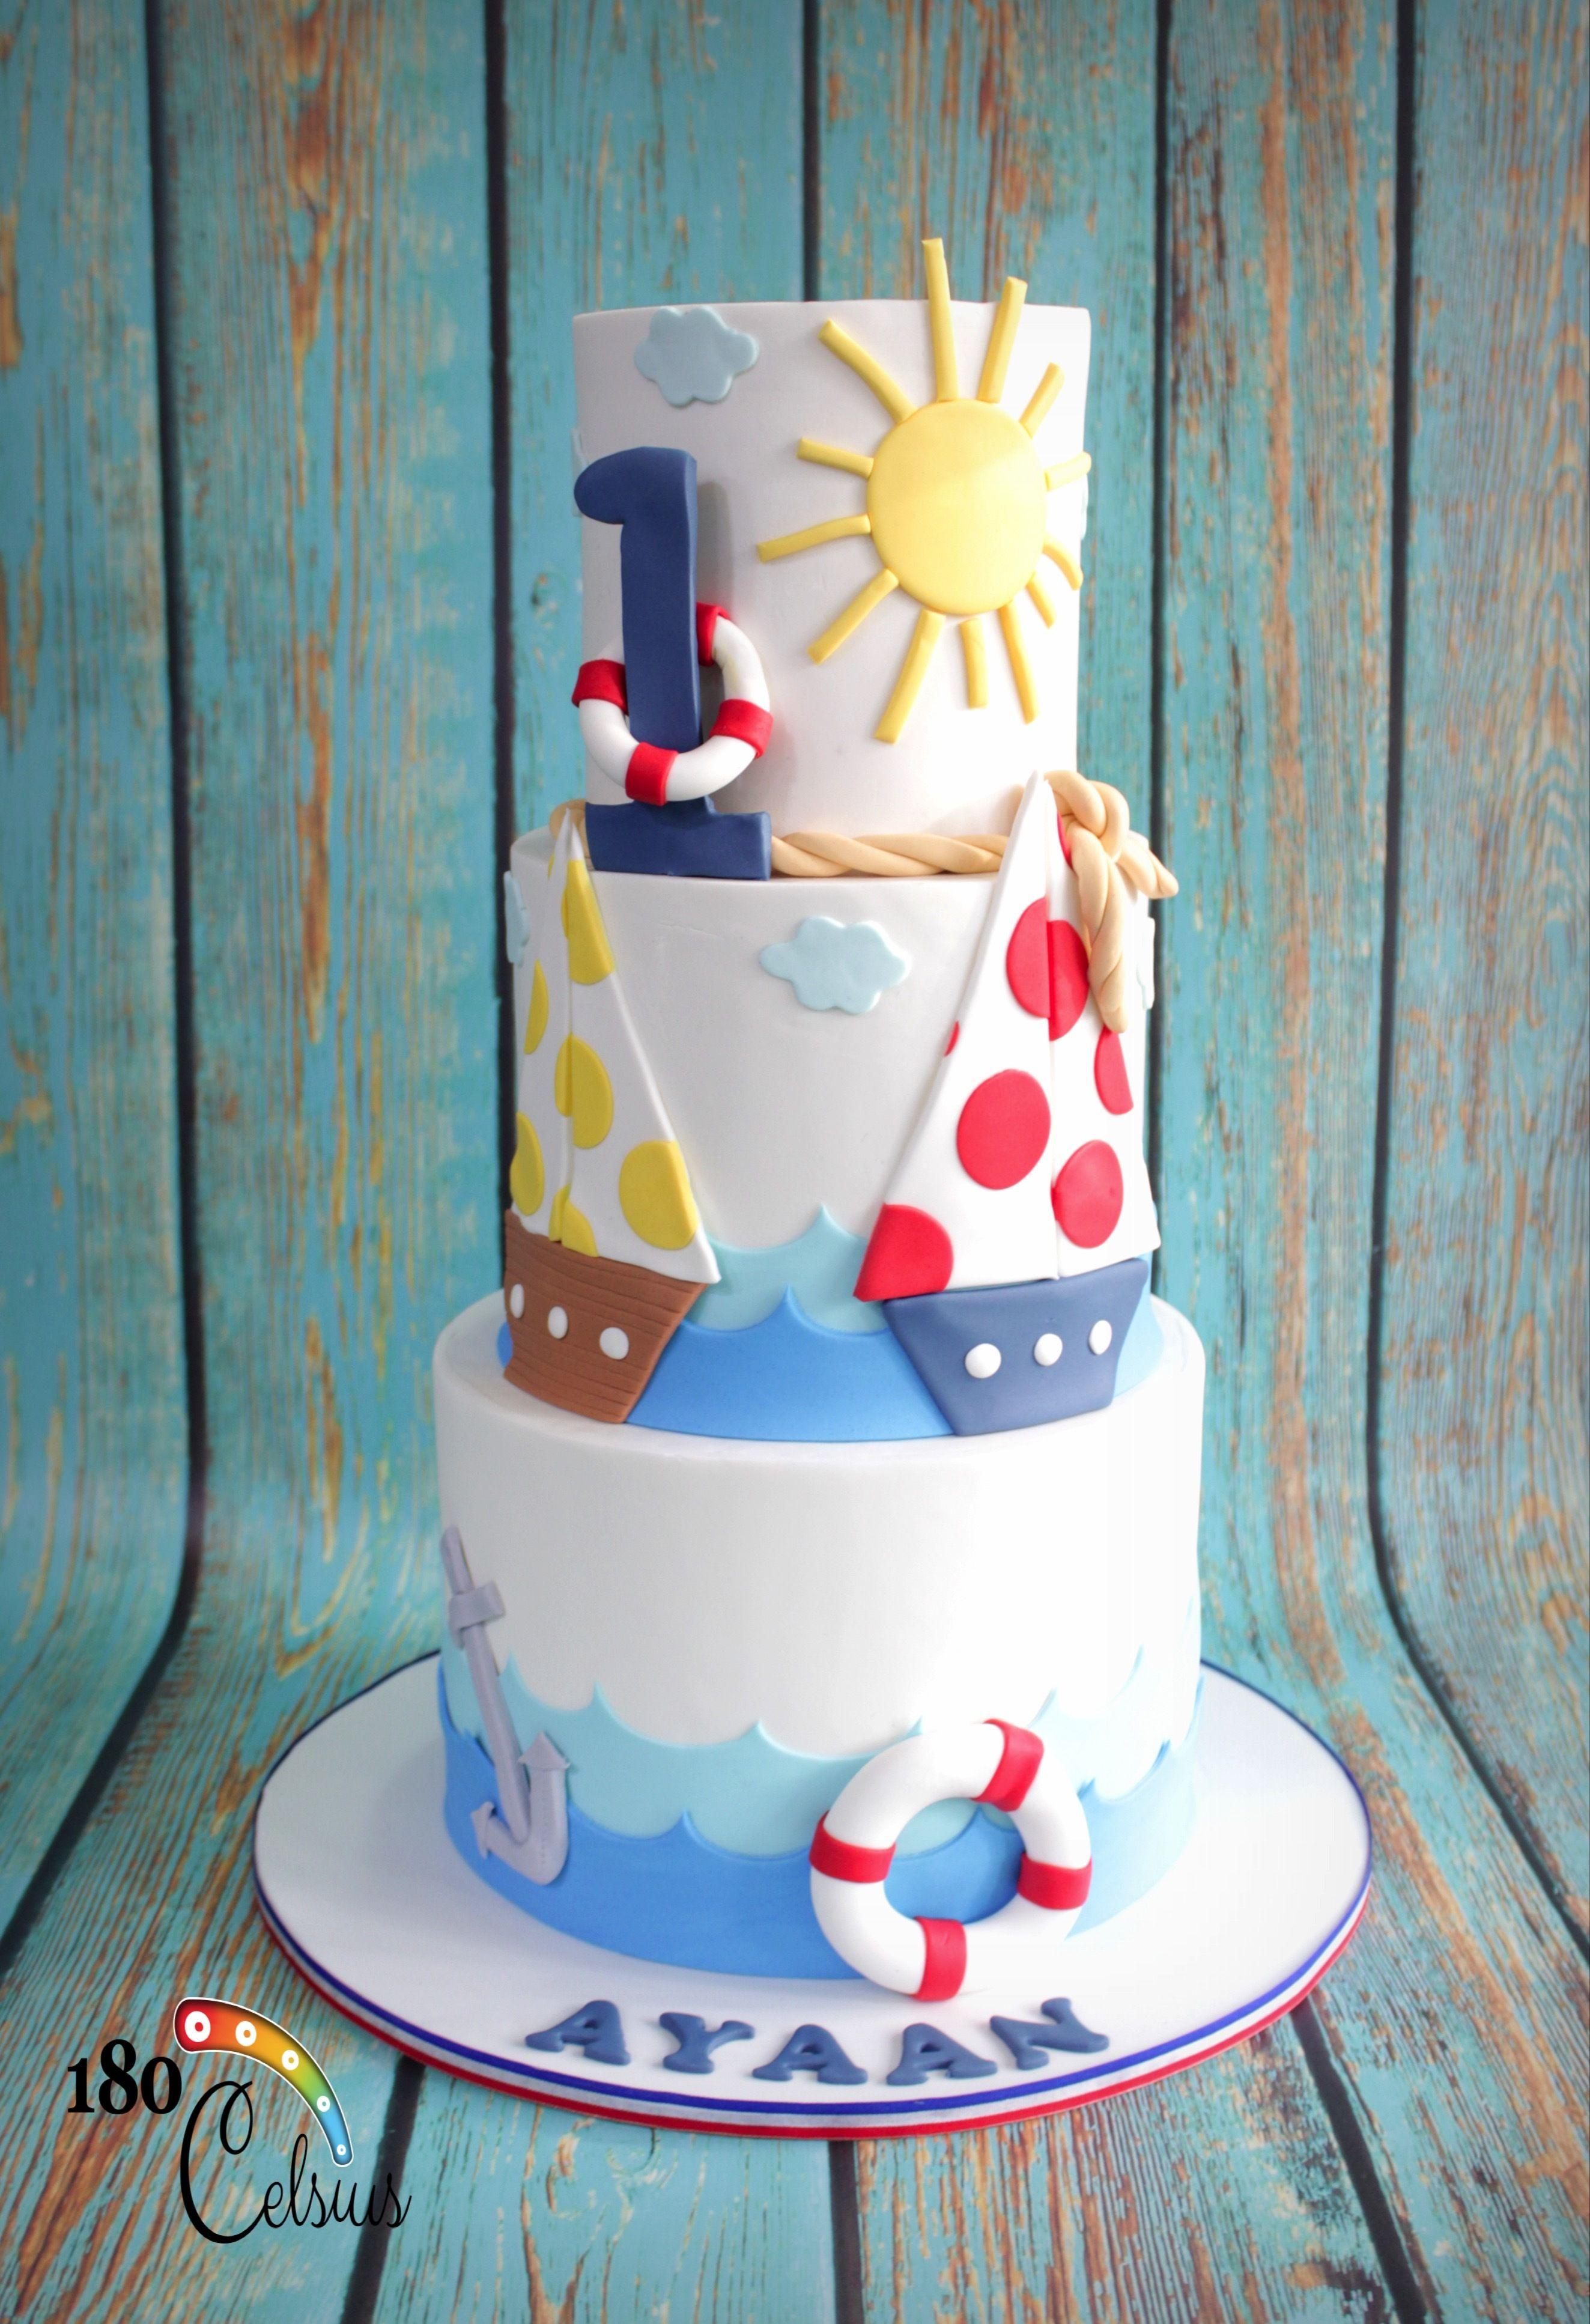 Swell 1St Birthday Boy Big Cakes Boy Birthday Cake 1St Boy Birthday Funny Birthday Cards Online Elaedamsfinfo